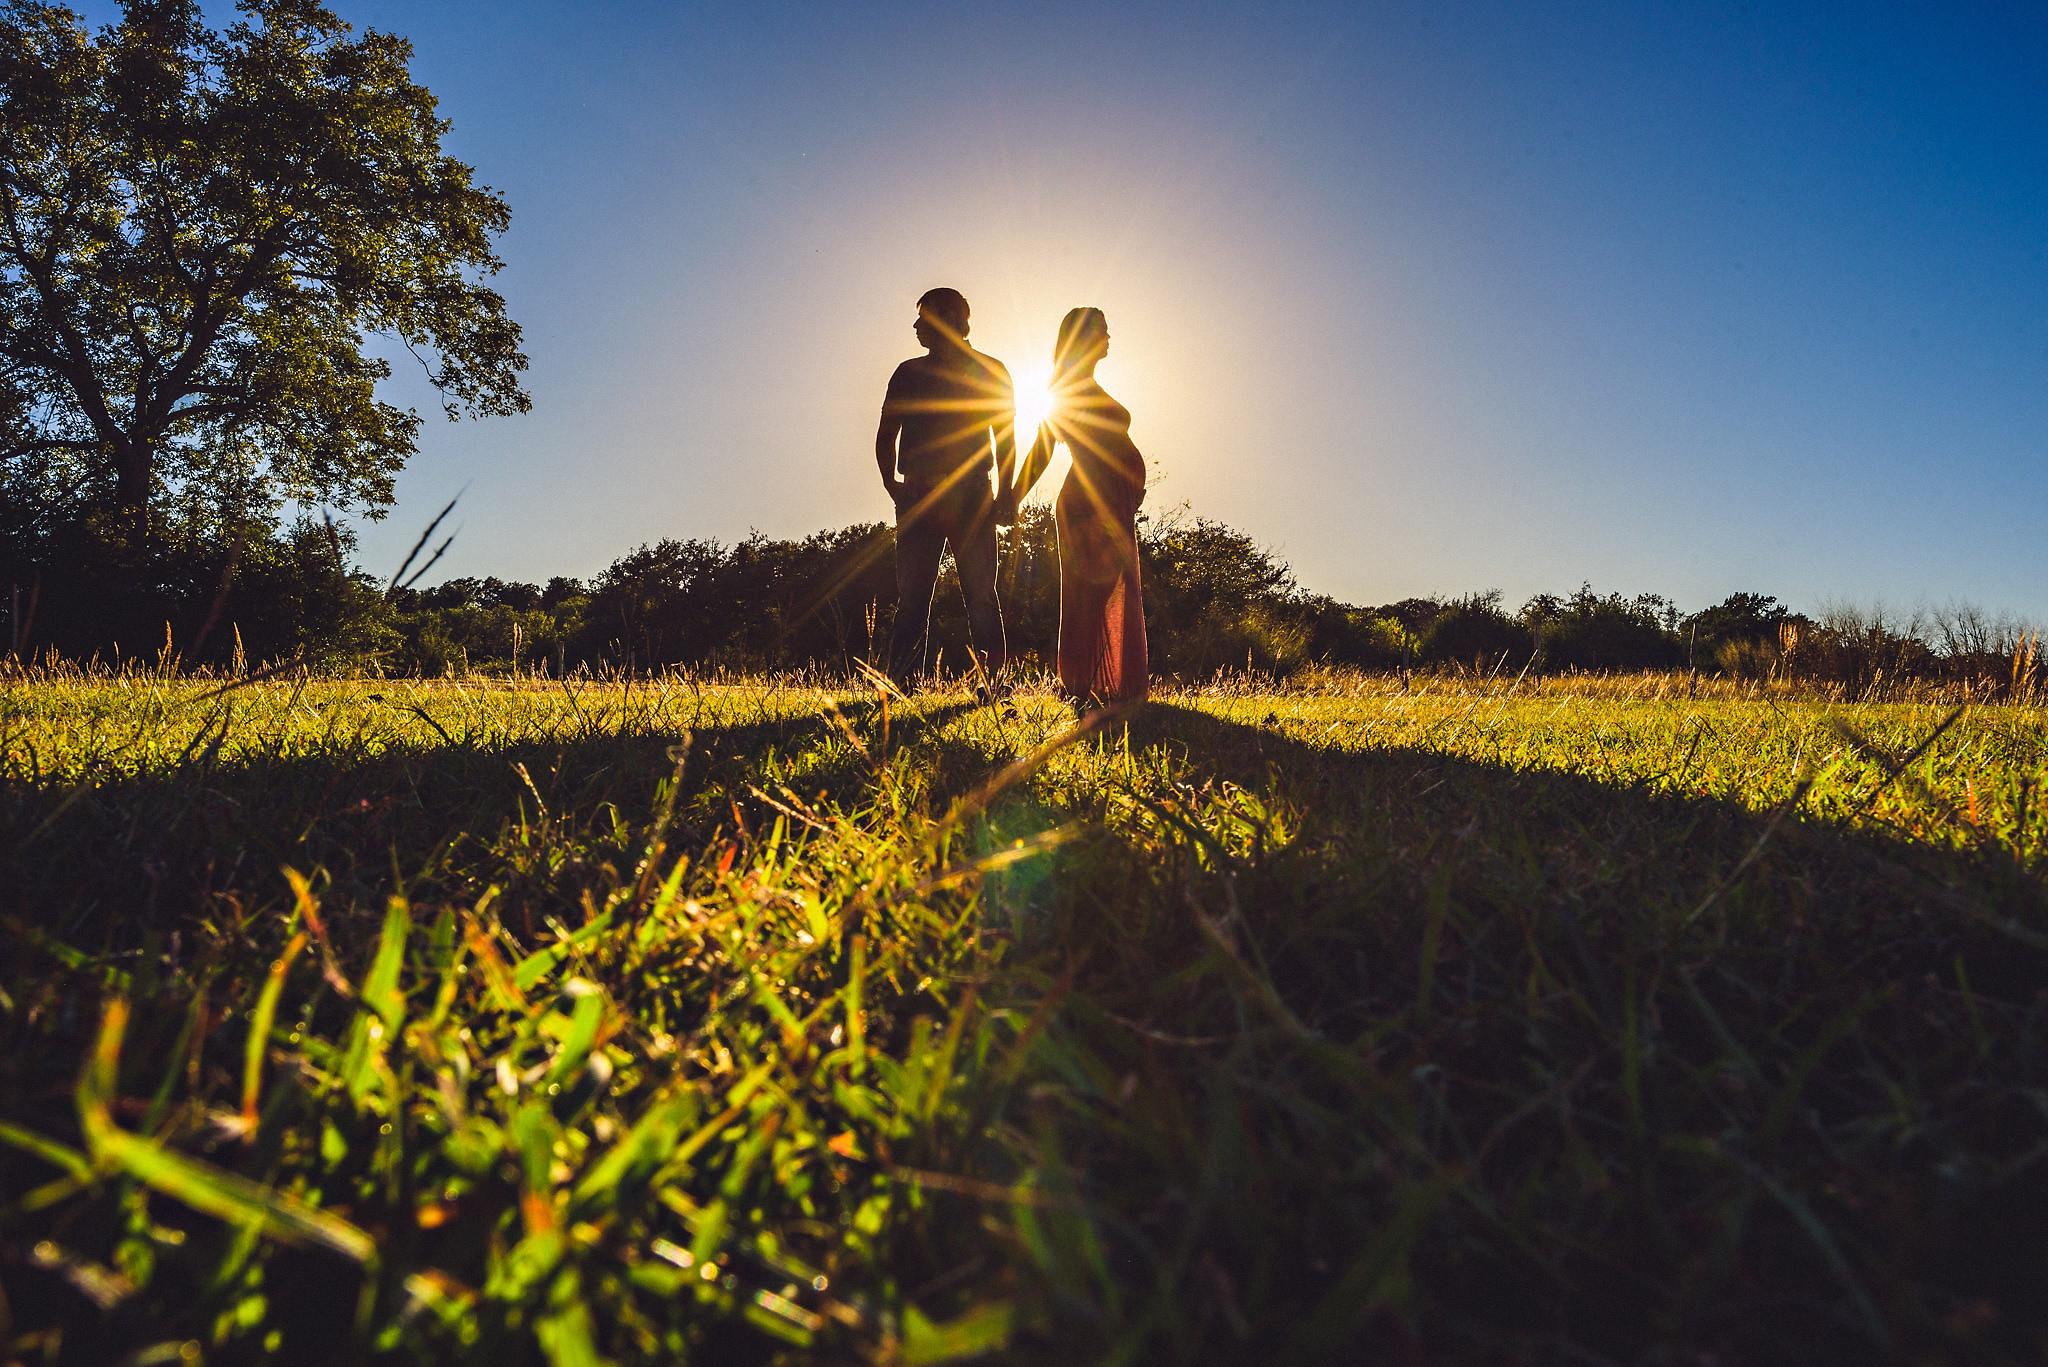 Eirik Halvorsen Austin Texas maternity photographer-7.jpg